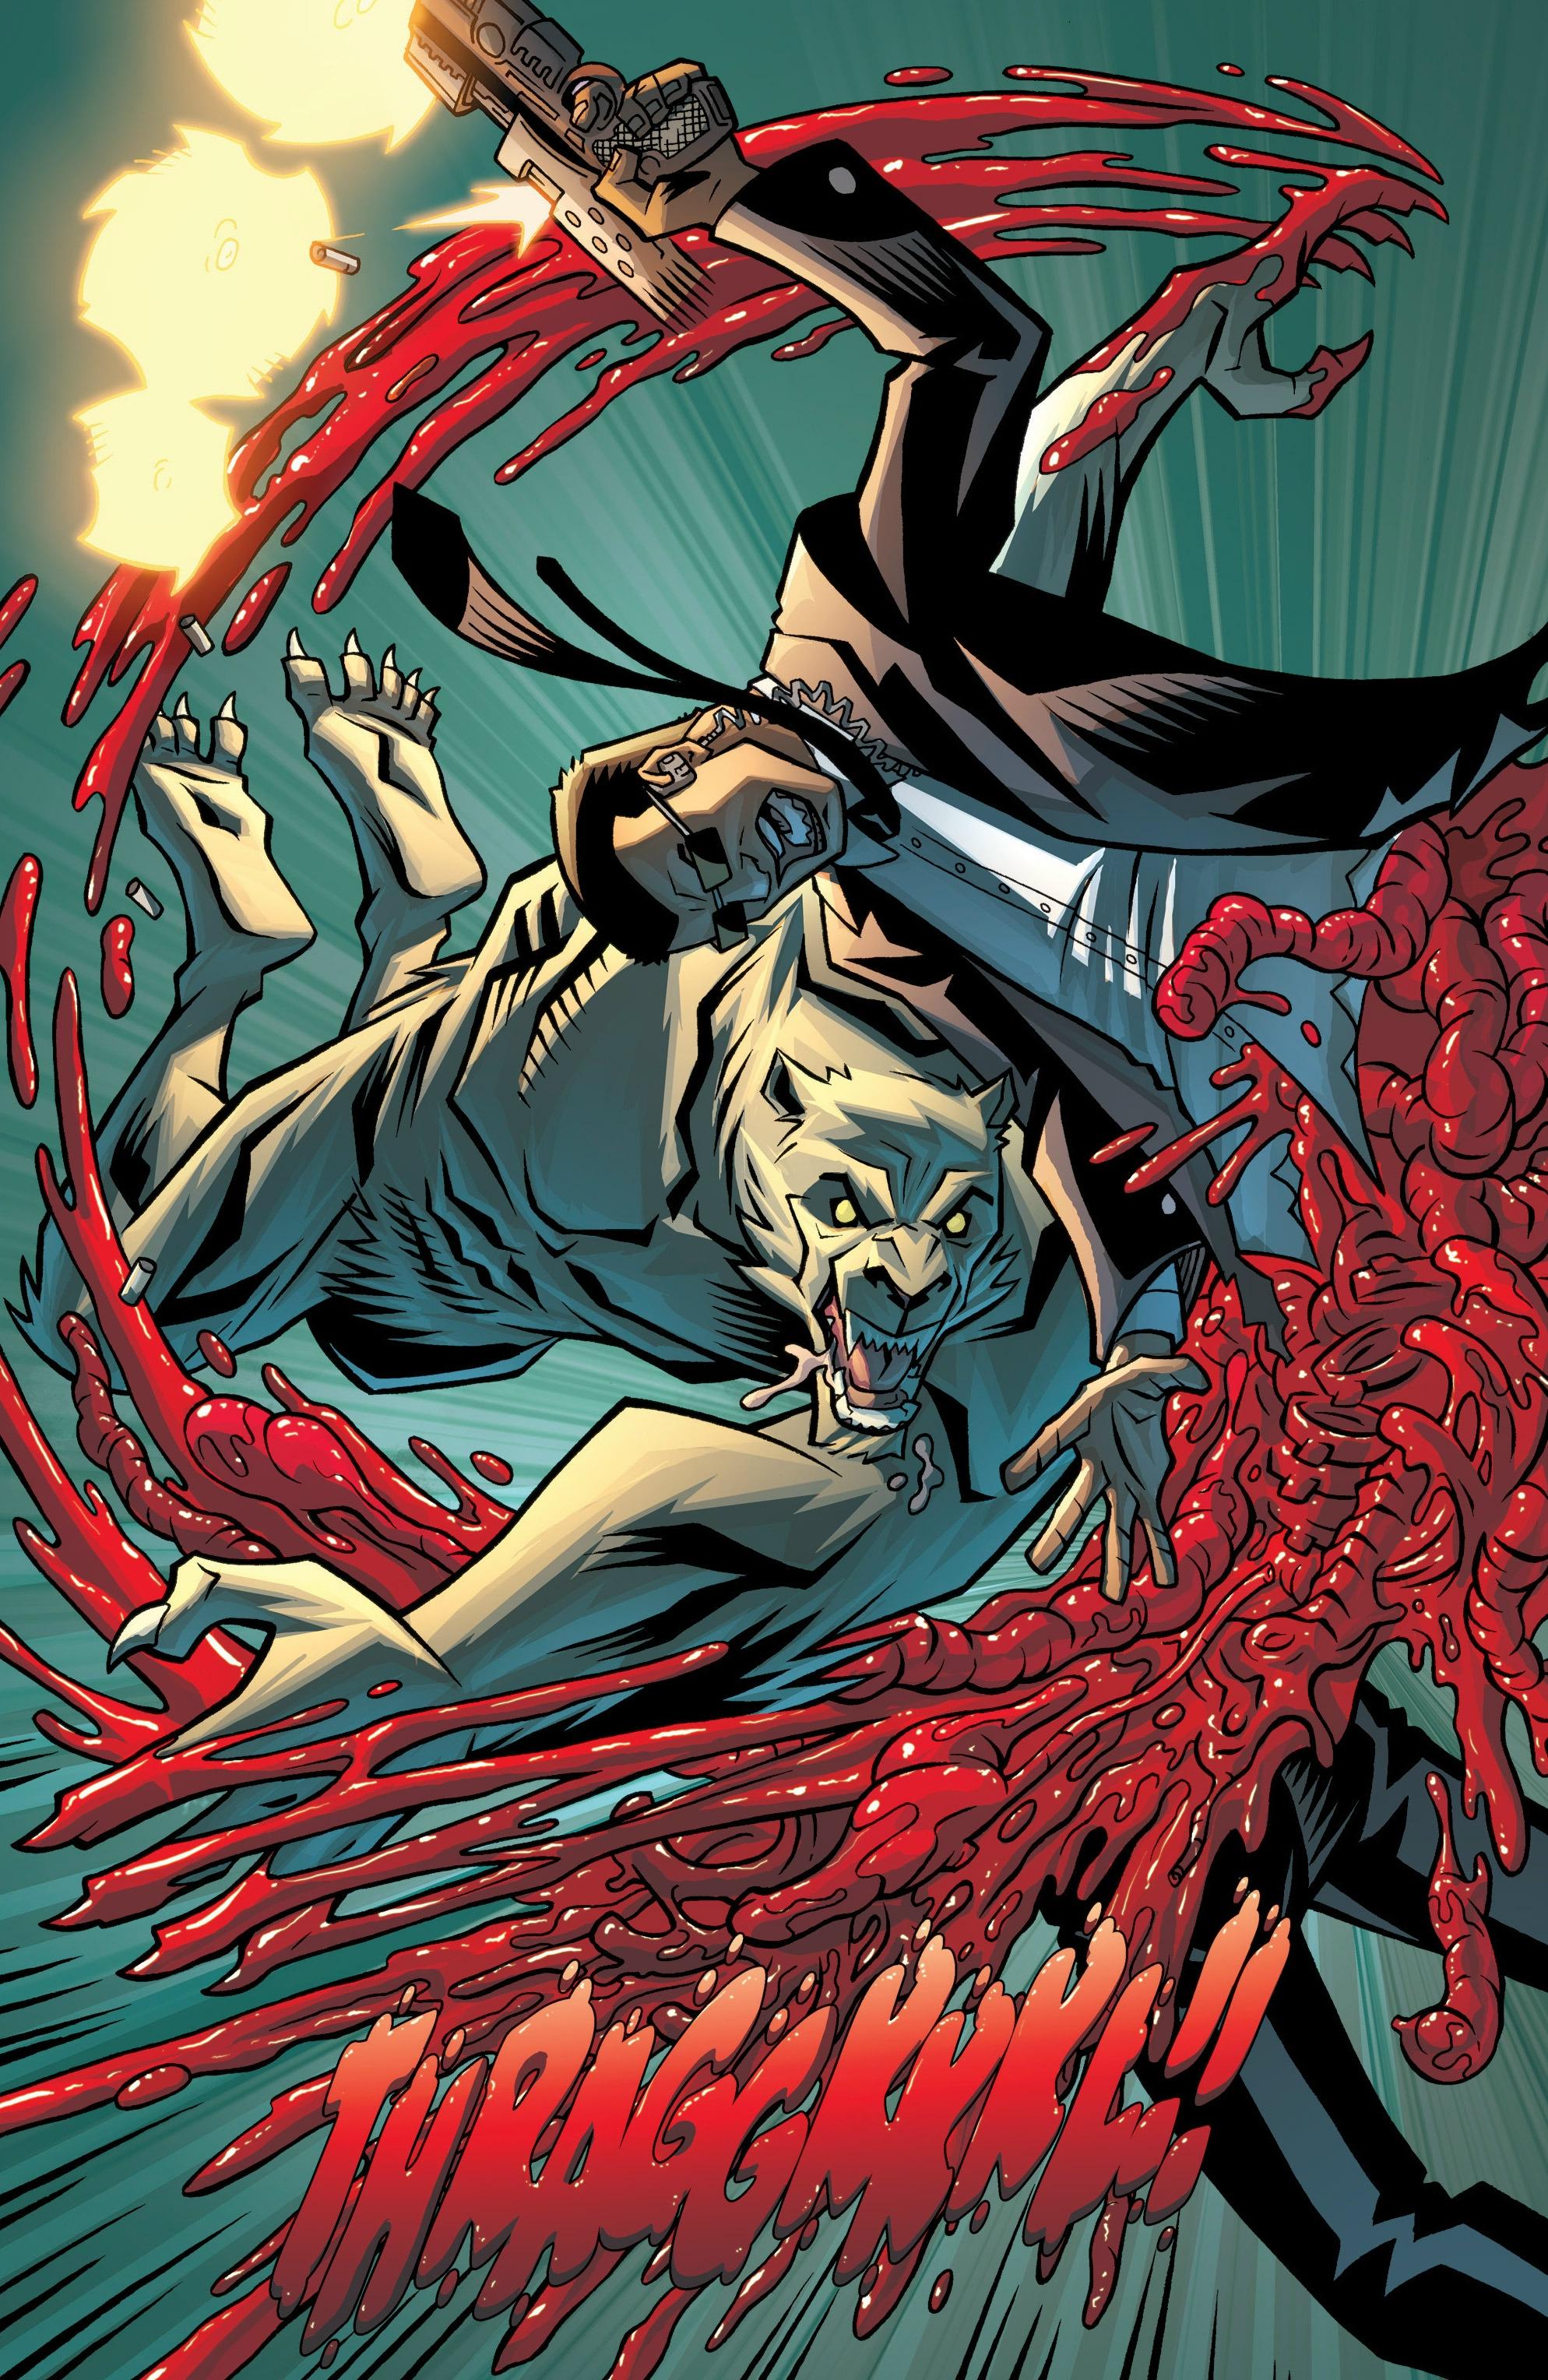 Astounding Wolf-Man Vol 1 9 002.jpg